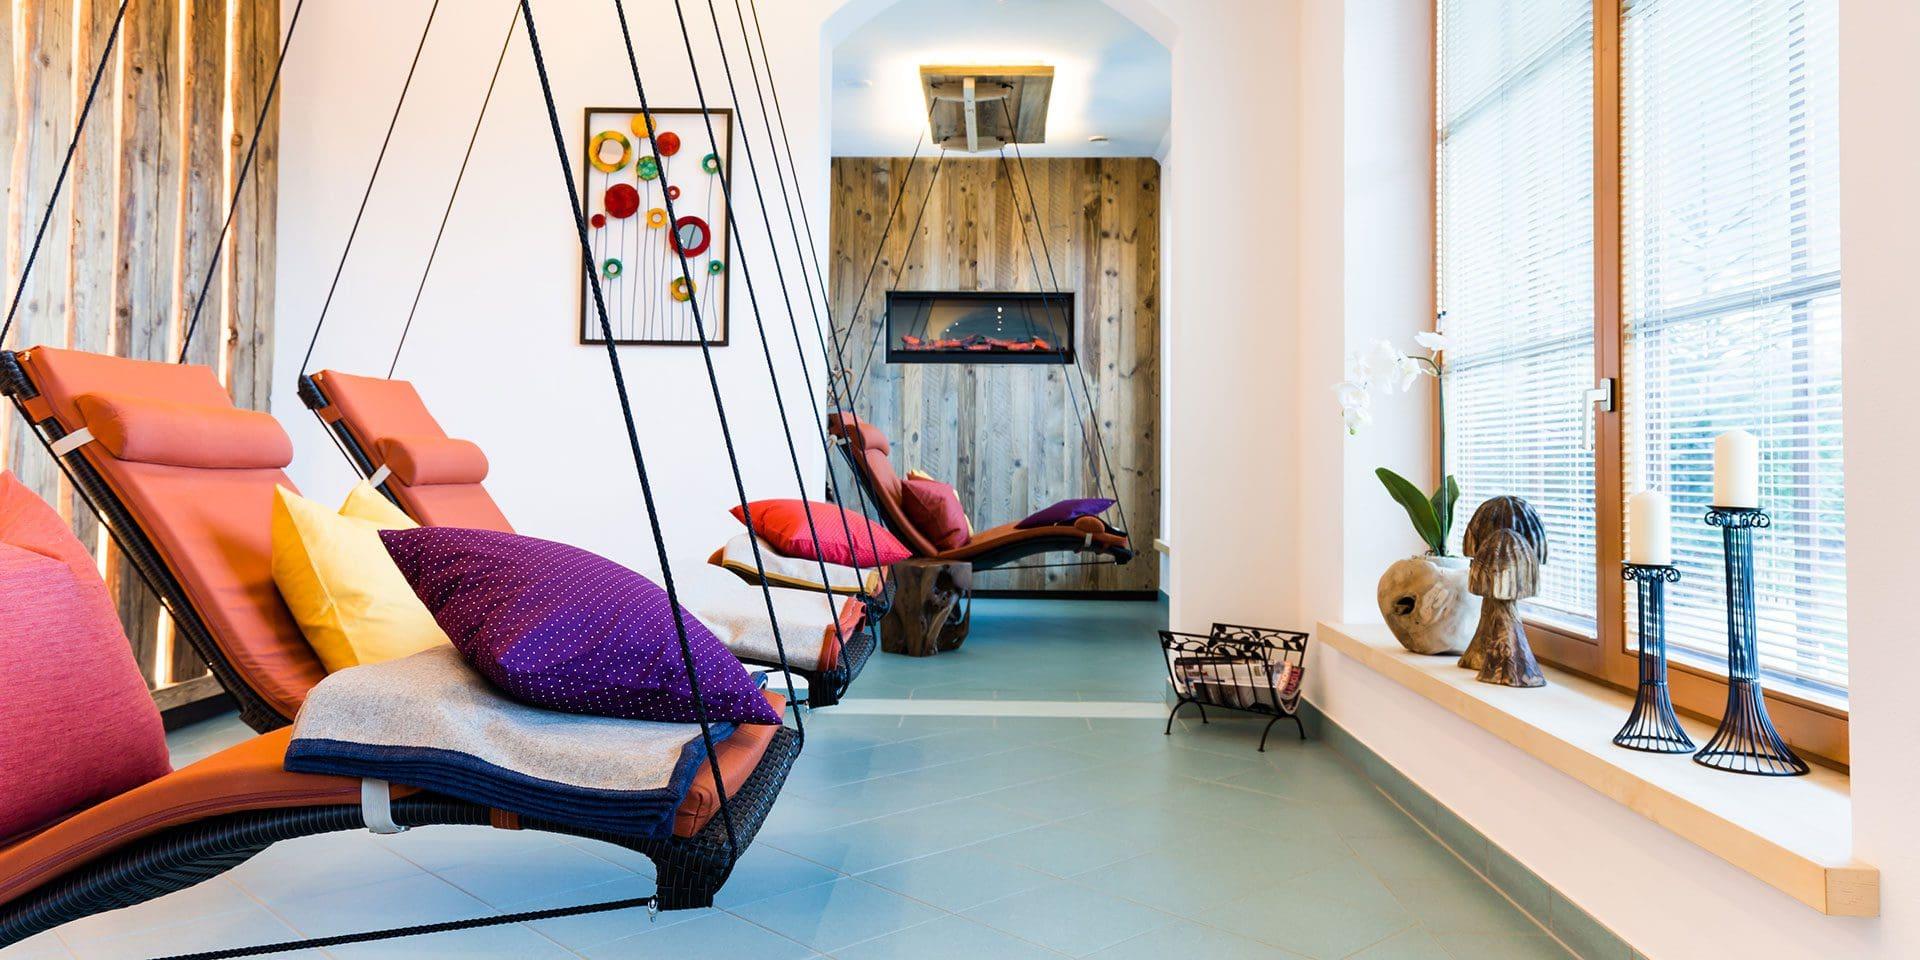 Indoor-Wellness · Inklusivleistungen im Wanderhotel Kirchner, Kitzbüheler Alpen